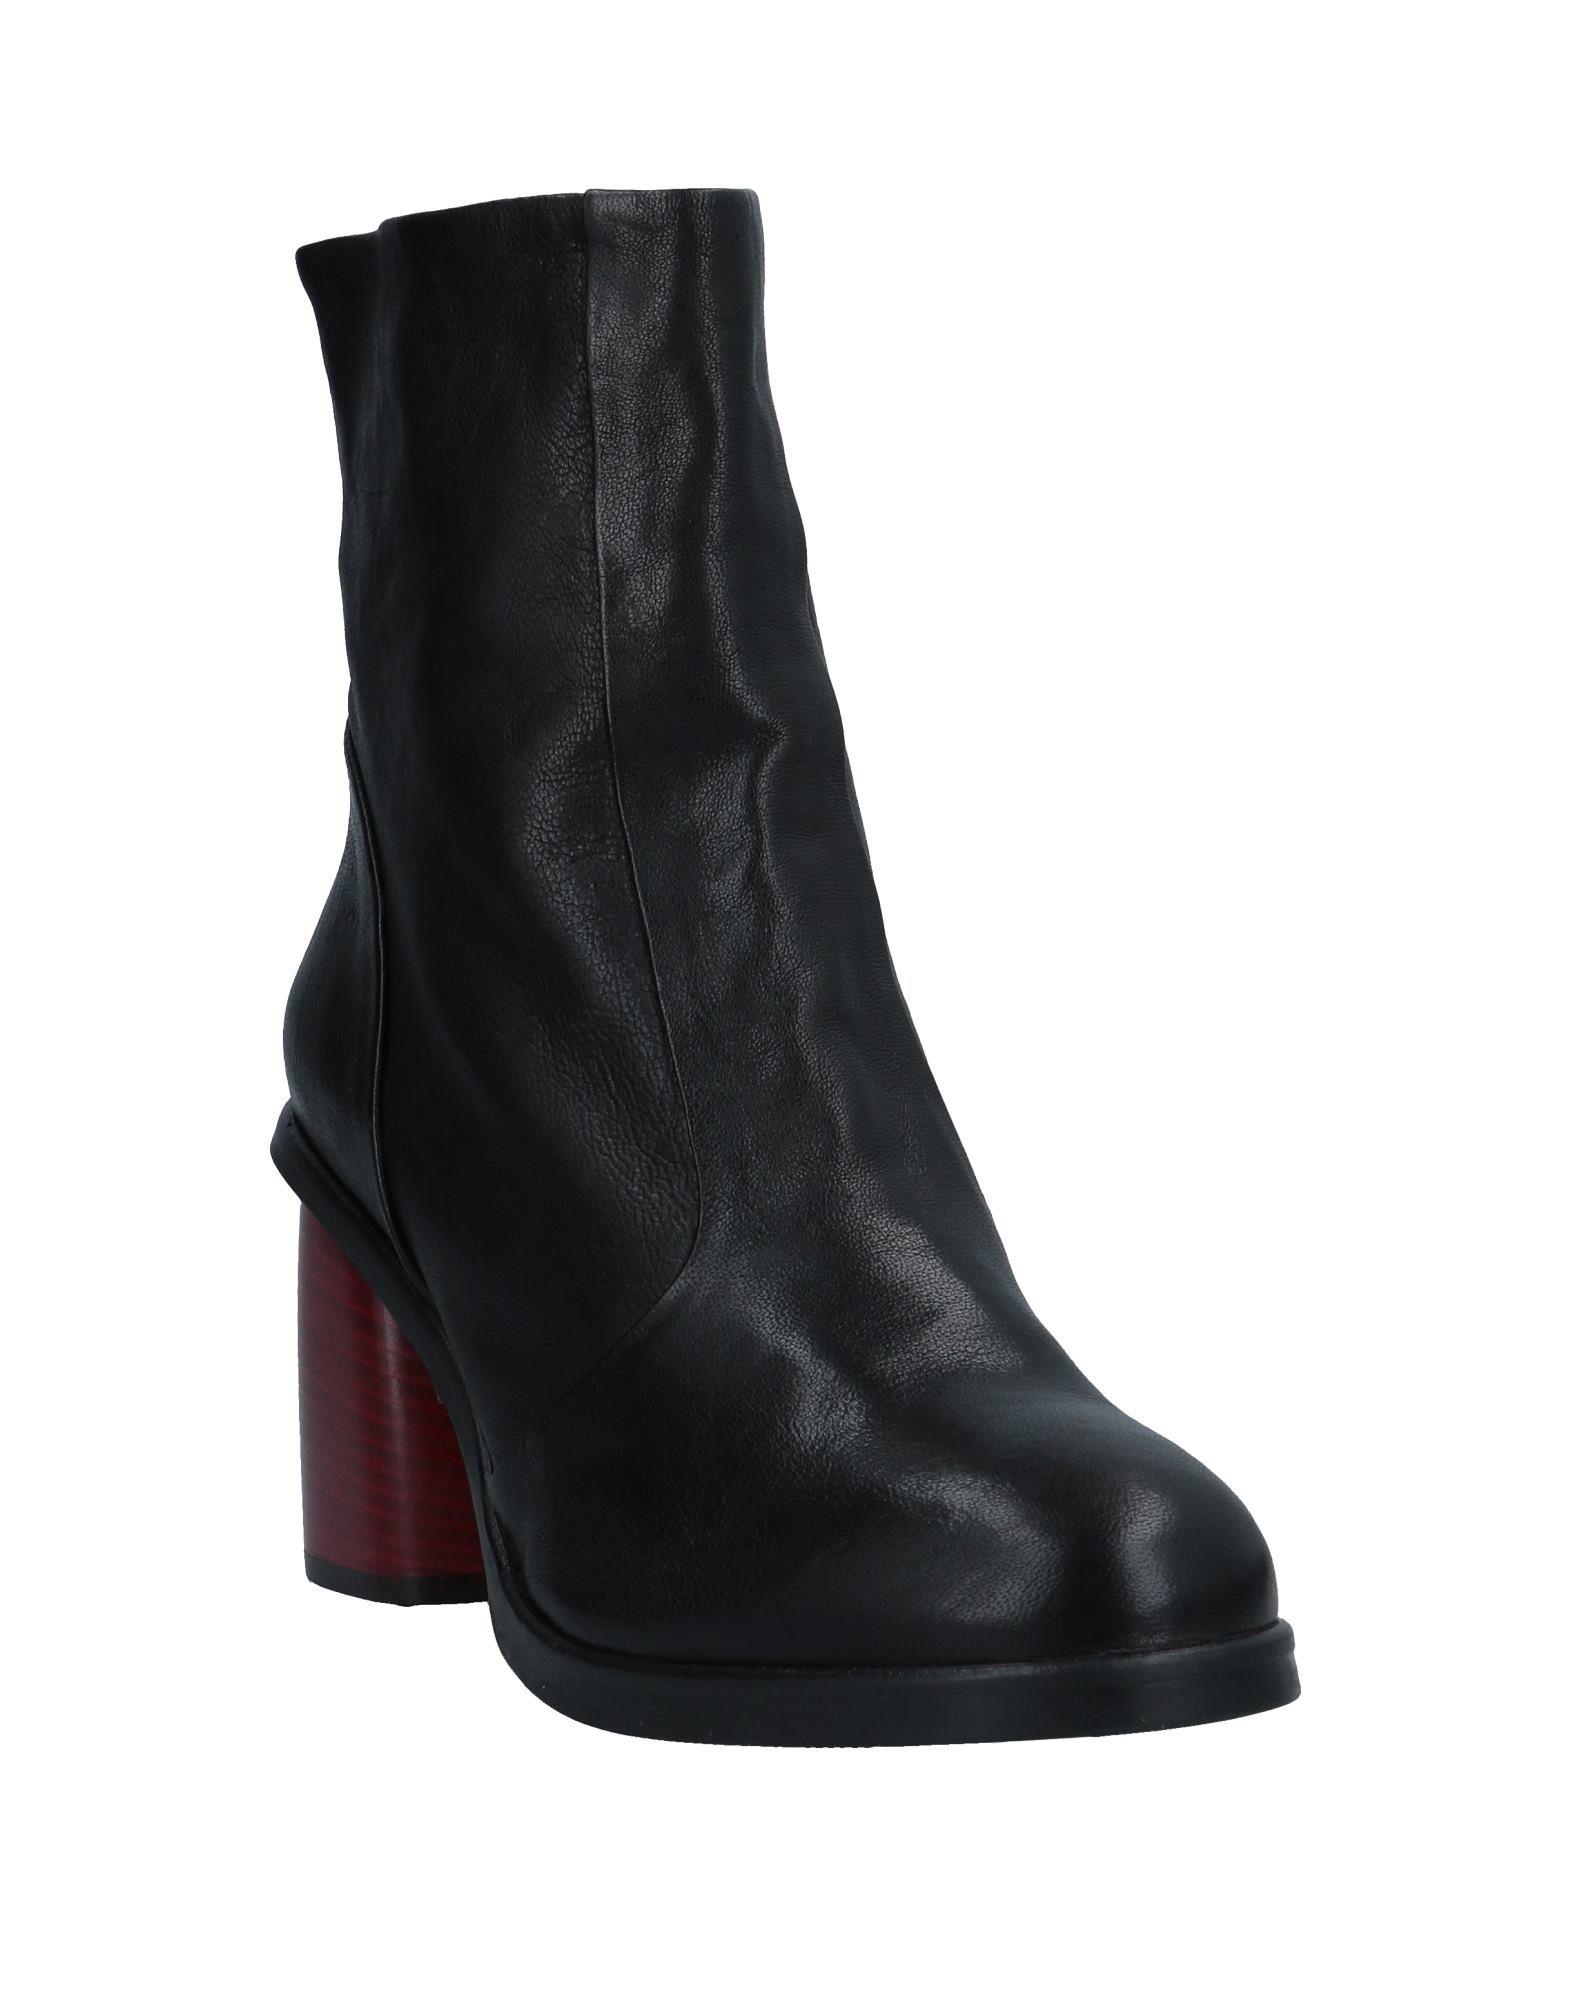 O'dan Li Stiefelette Damen beliebte  11549100QR Gute Qualität beliebte Damen Schuhe 77db56